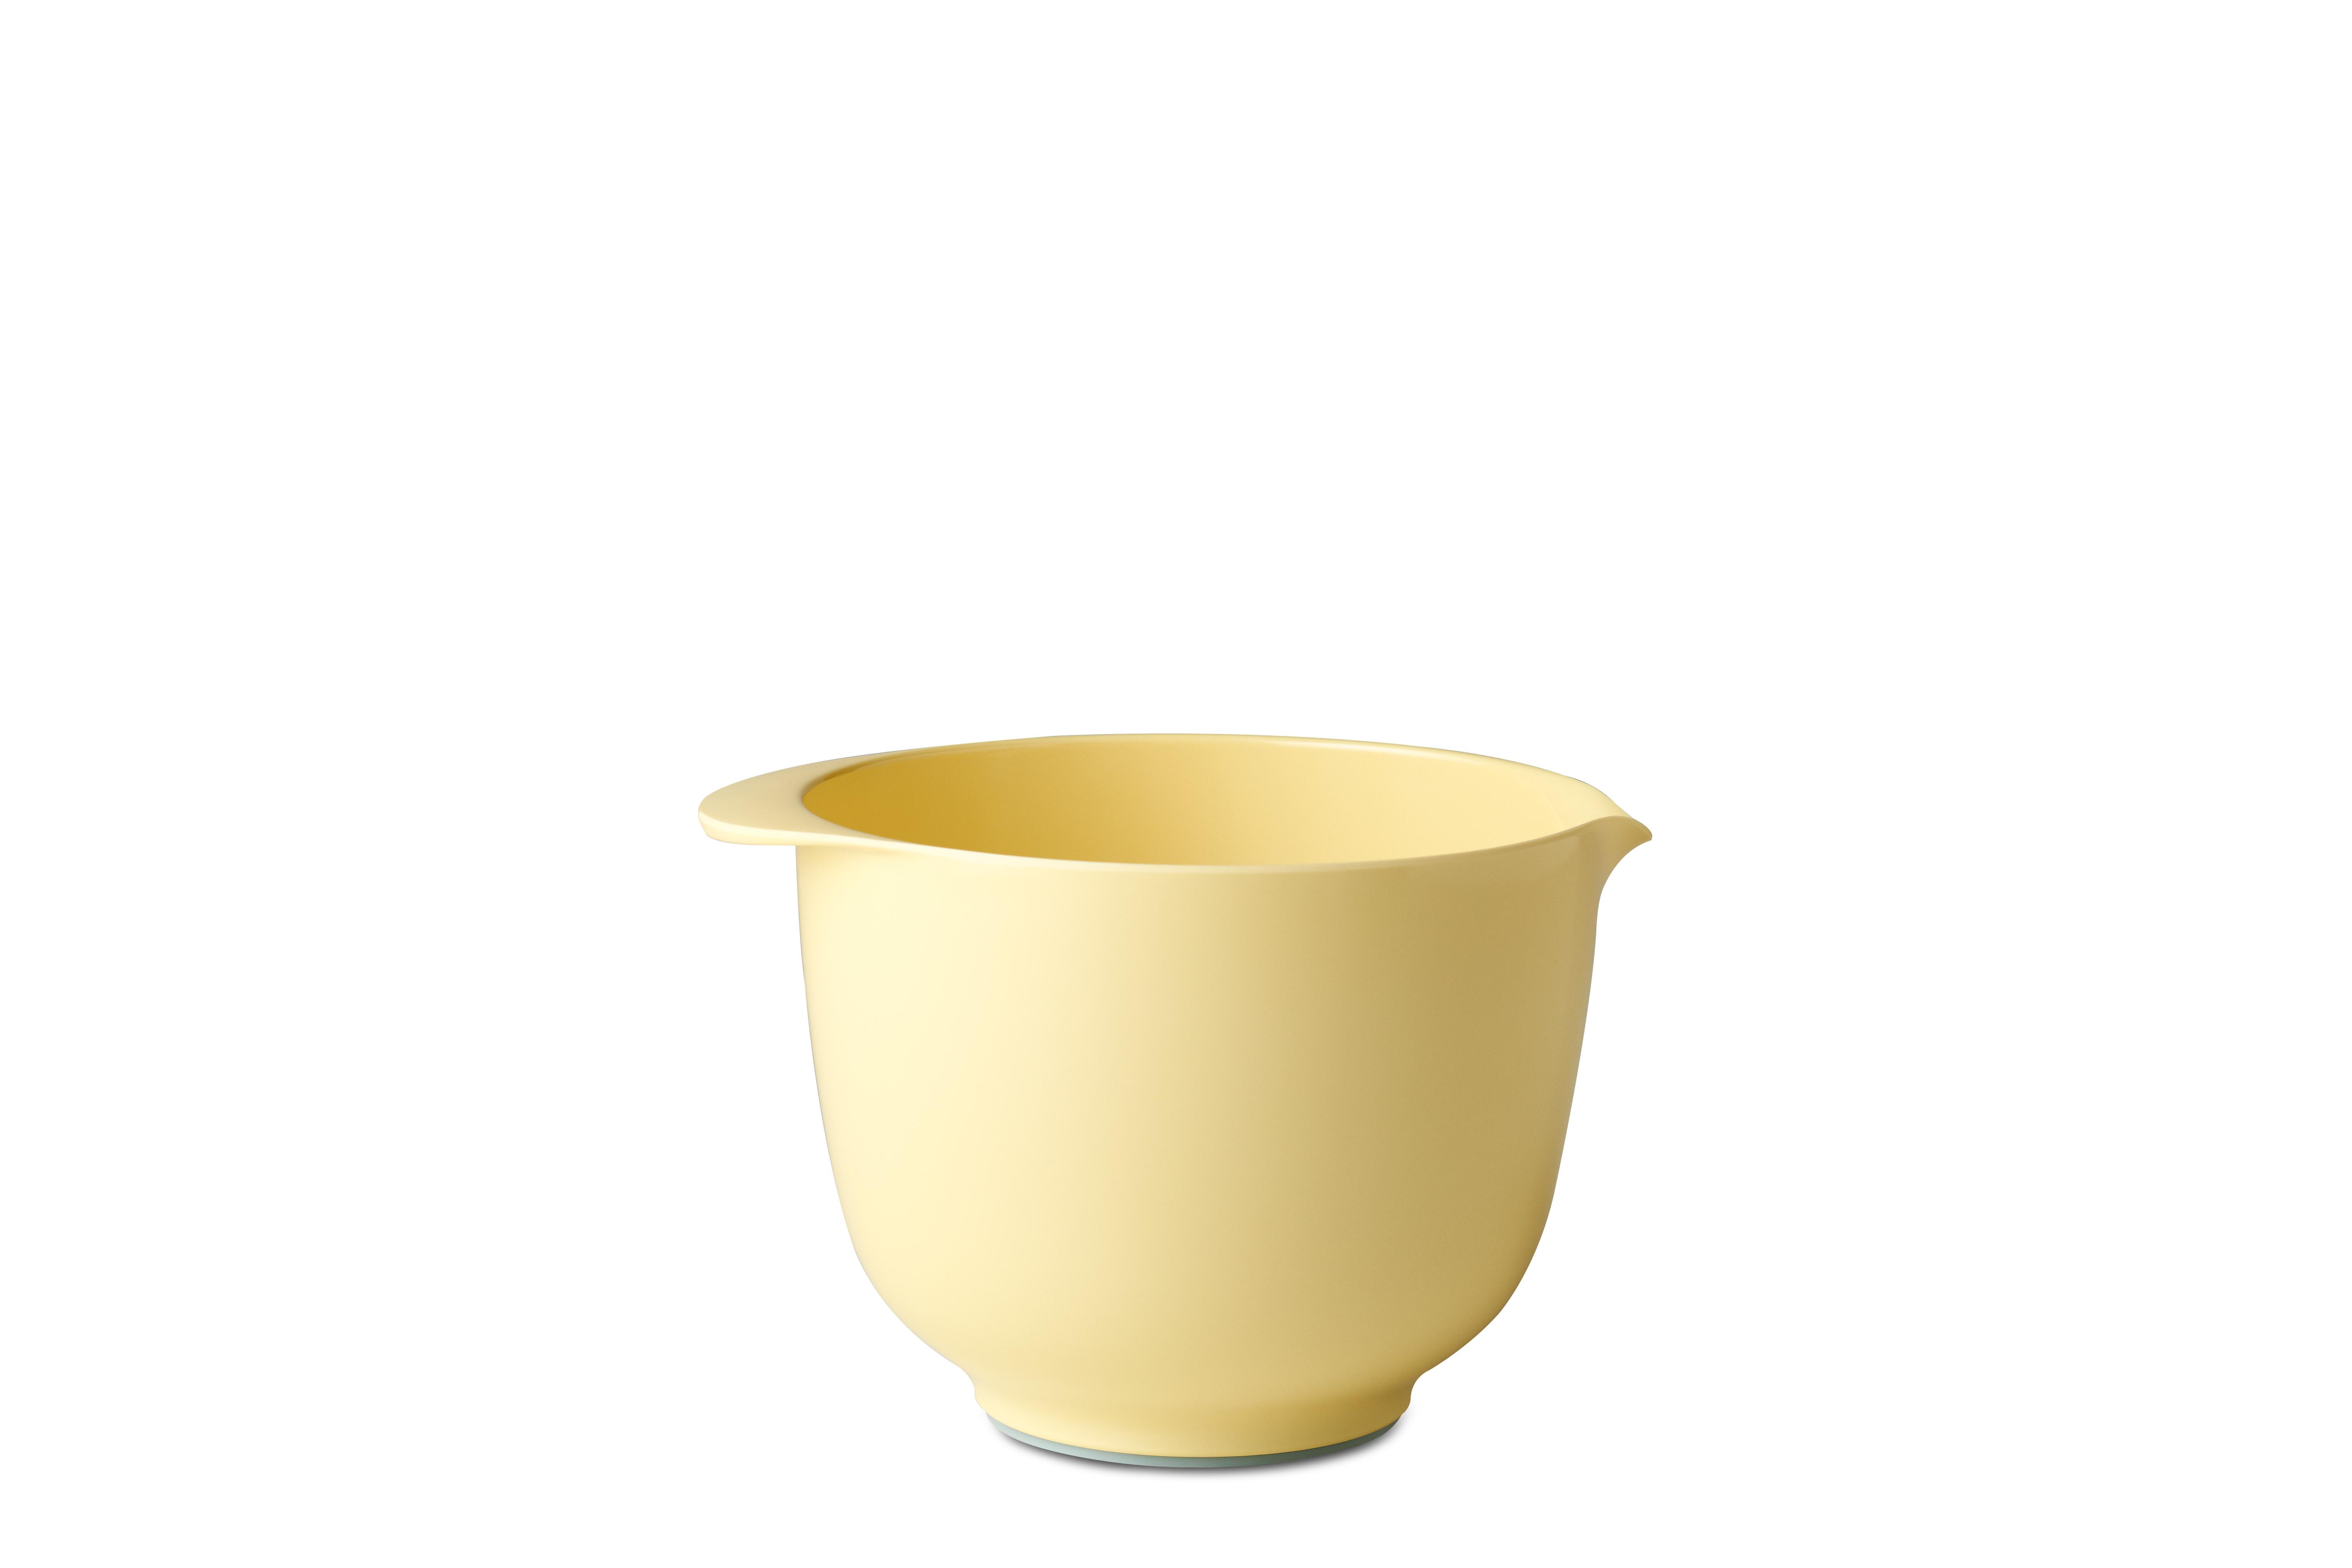 rosti mepal r hrsch ssel margrethe 1 5 l retro gelb 102503081200. Black Bedroom Furniture Sets. Home Design Ideas